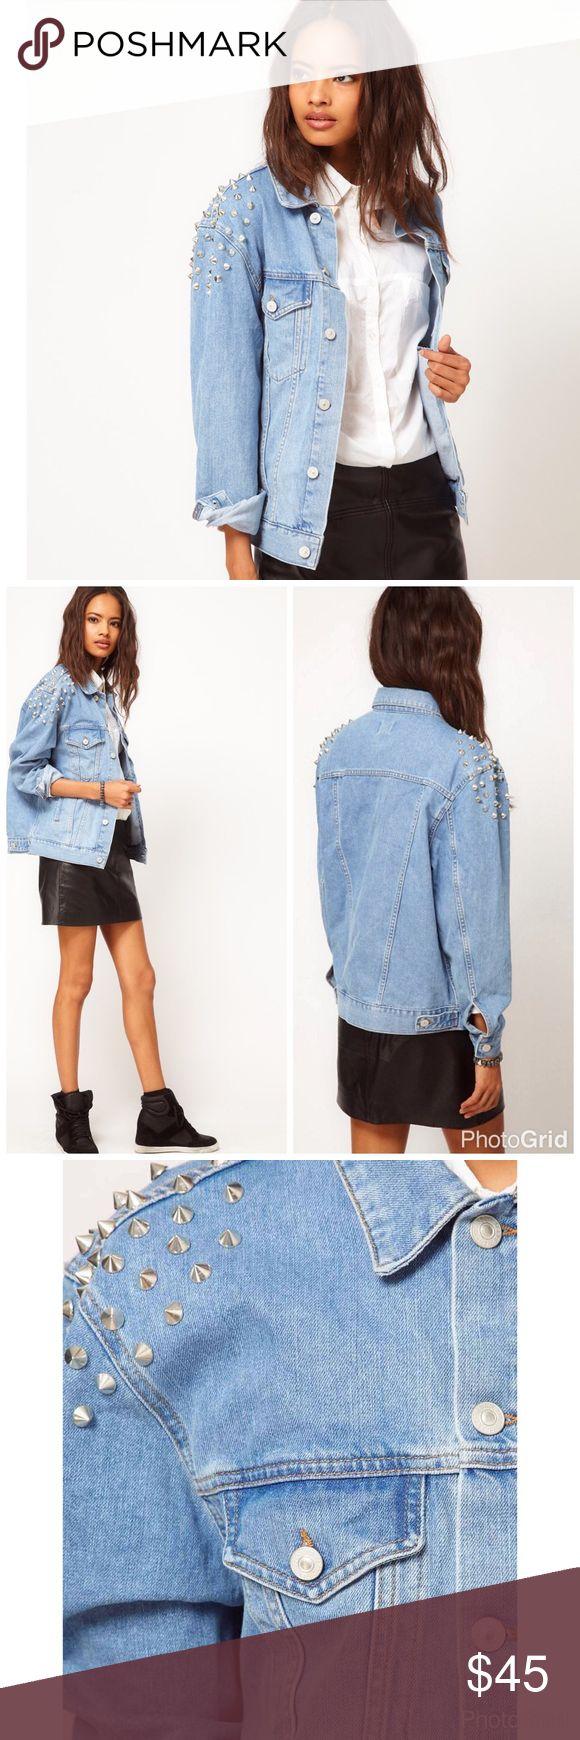 ASOS denim boyfriend jacket w/studs BNWT ASOS denim boyfriend jacket w/studs BNWT US14 ASOS Jackets & Coats Jean Jackets